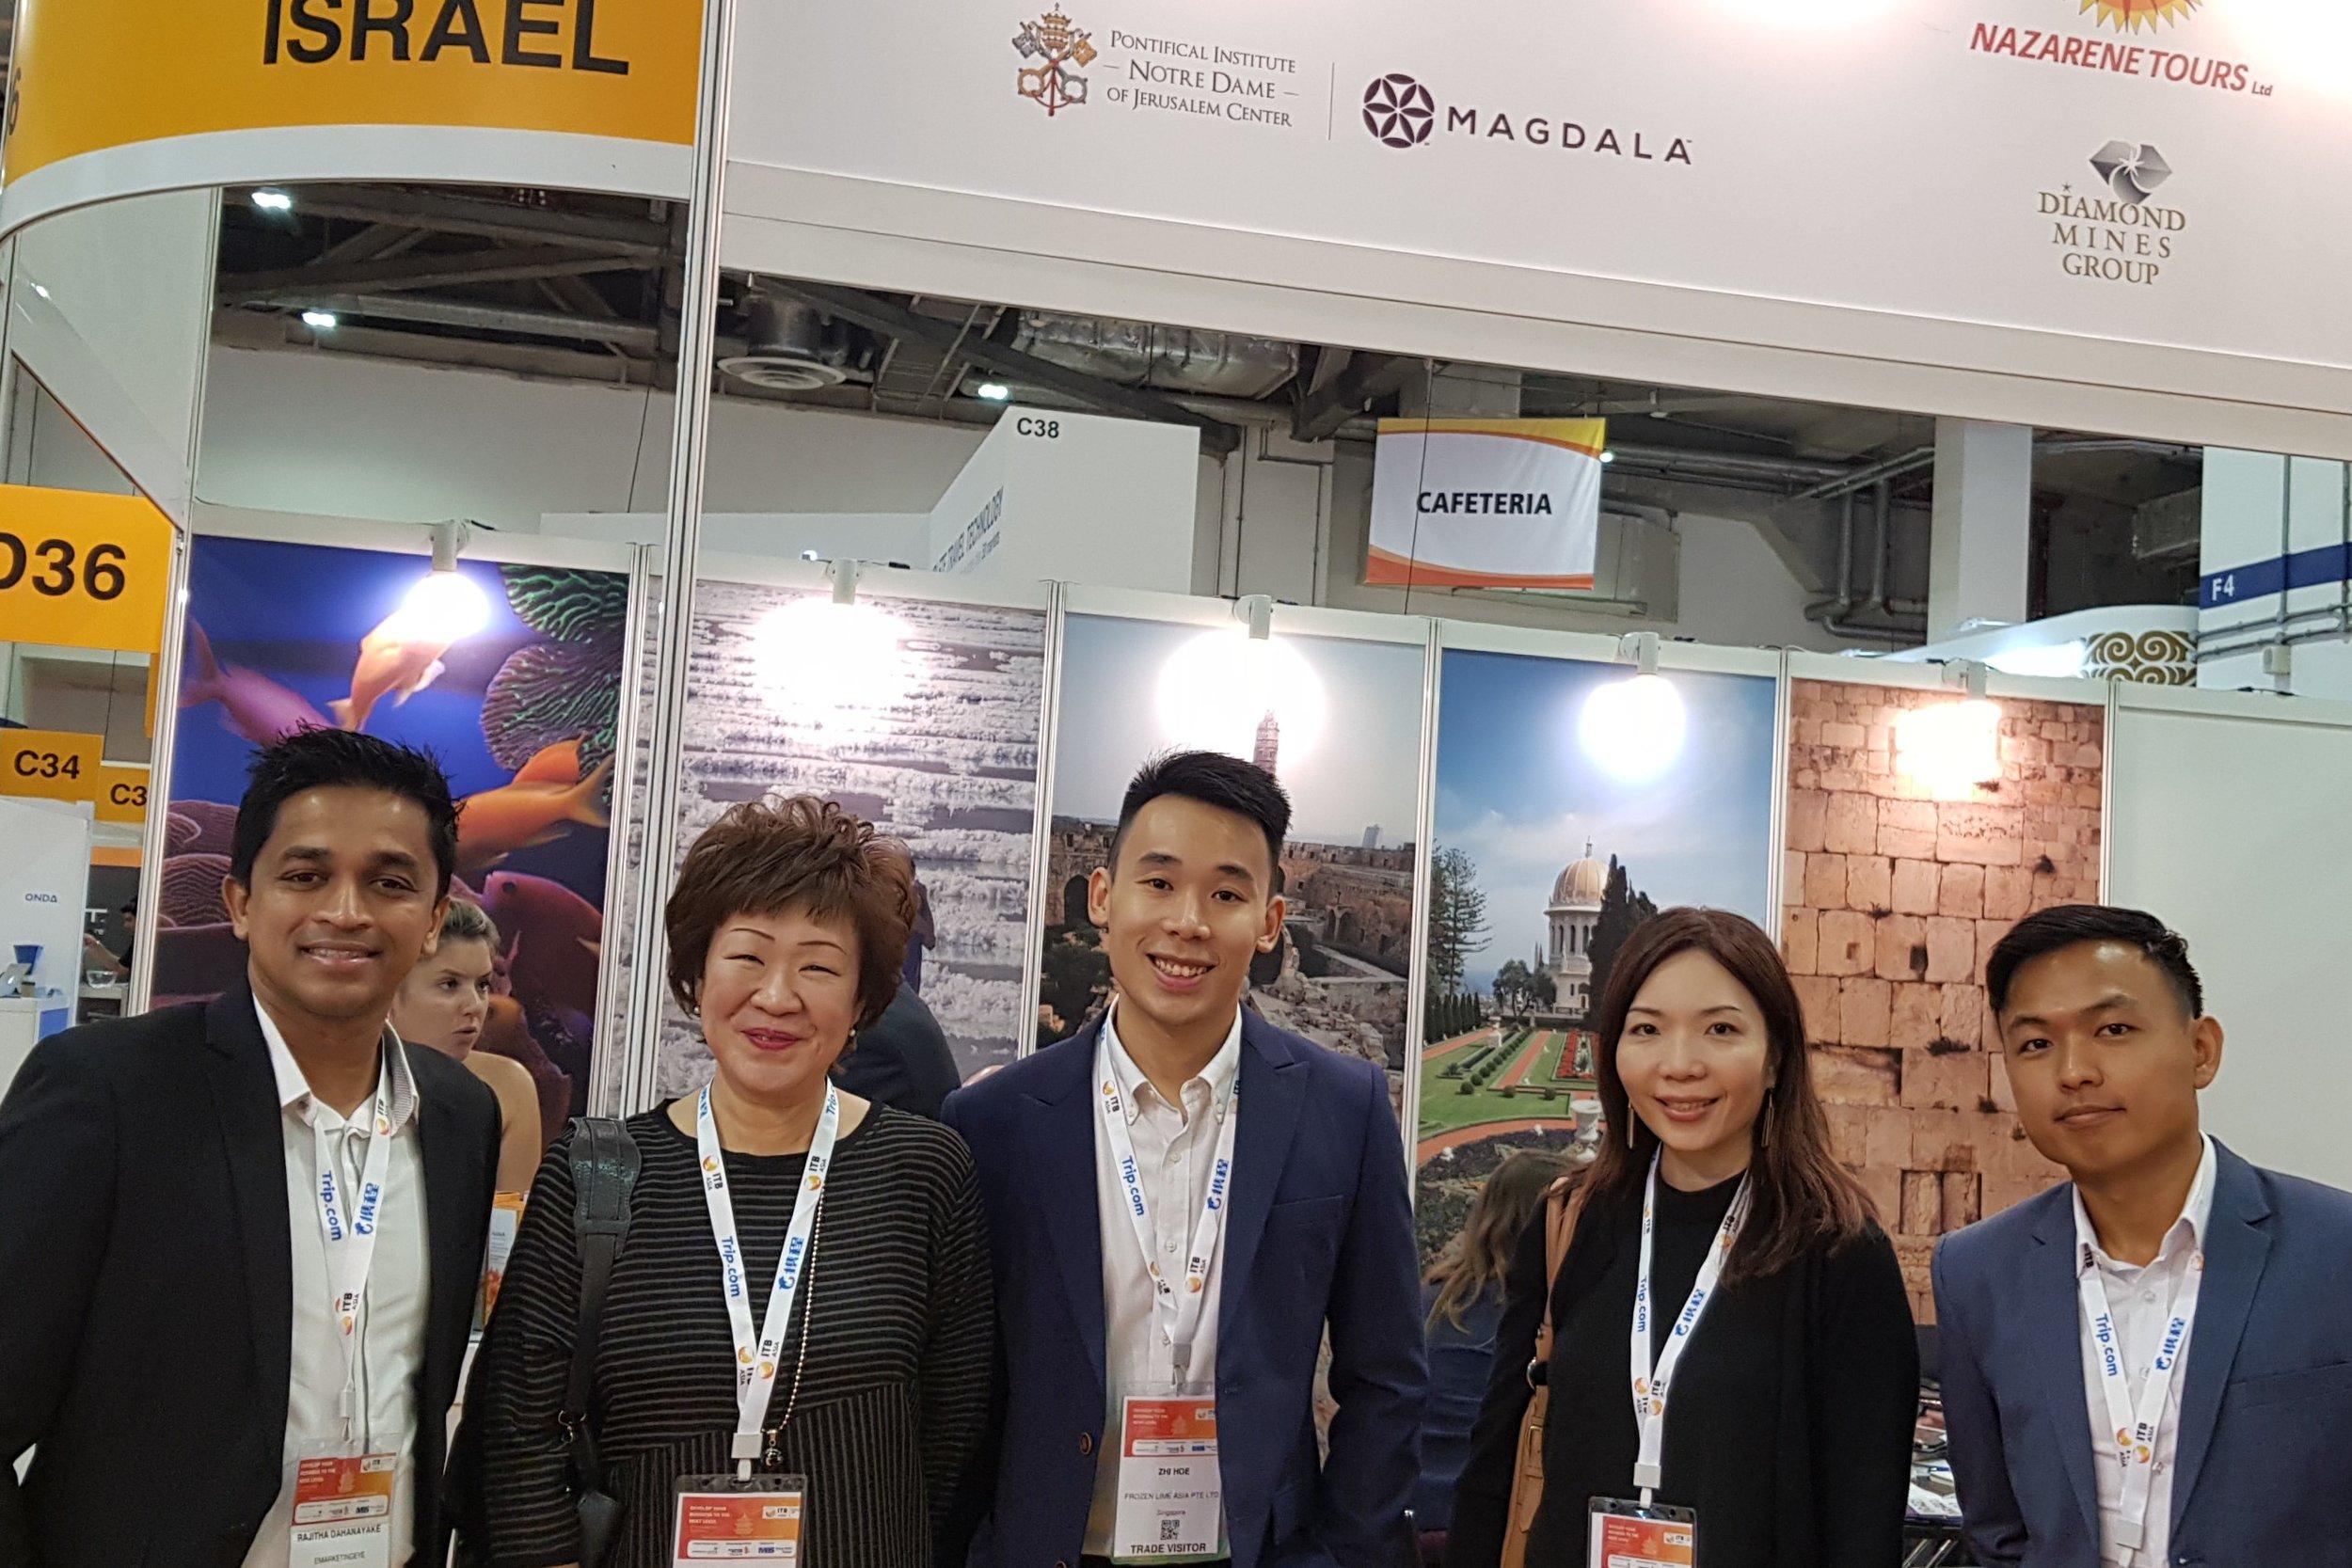 From left to right: Mr Rajitha Dahanayake (eMarketingEye), Ms Aileene Thangaveloo (FLA), Mr Pow Zhi Hoe (FLA), Ms Jasmine Teow (FLA), Mr Leonard Chiang (FLA).